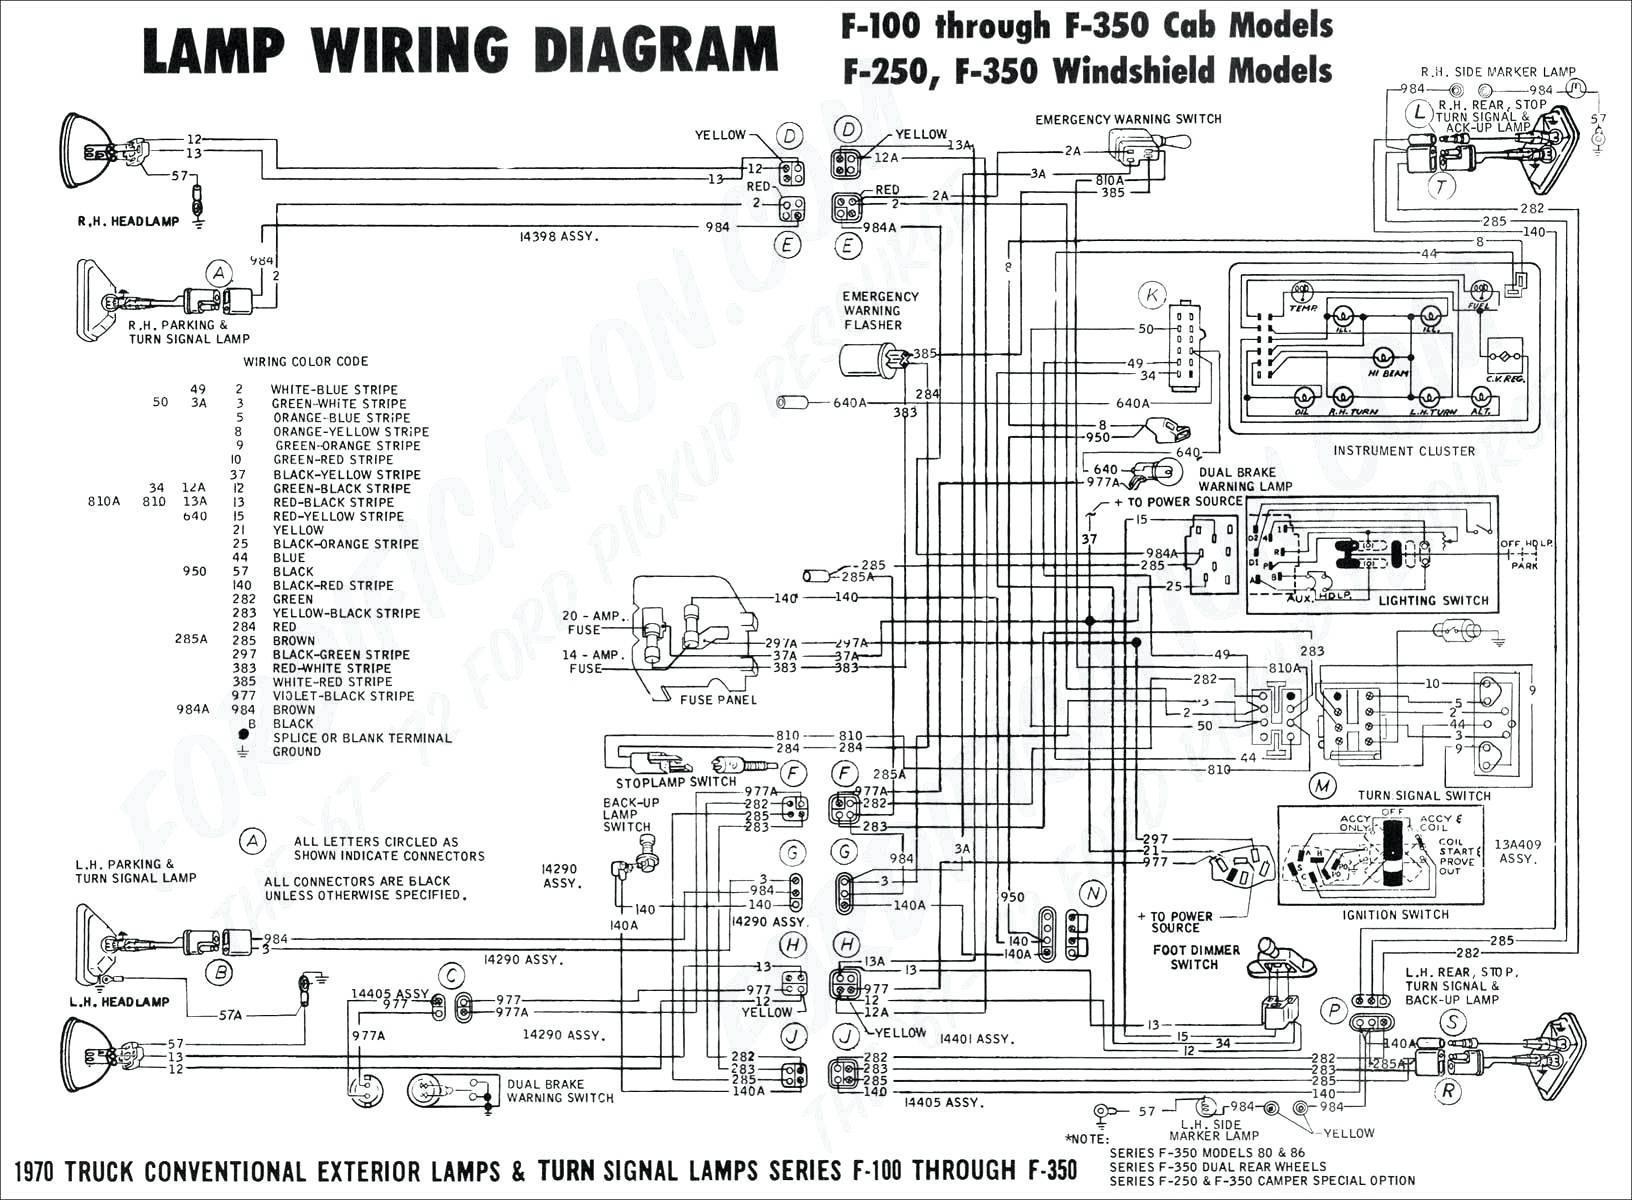 bogen paging system wiring diagram parts of a cathedral hospital 19 21 kenmo lp de schematic rh 103 wihado systems phone